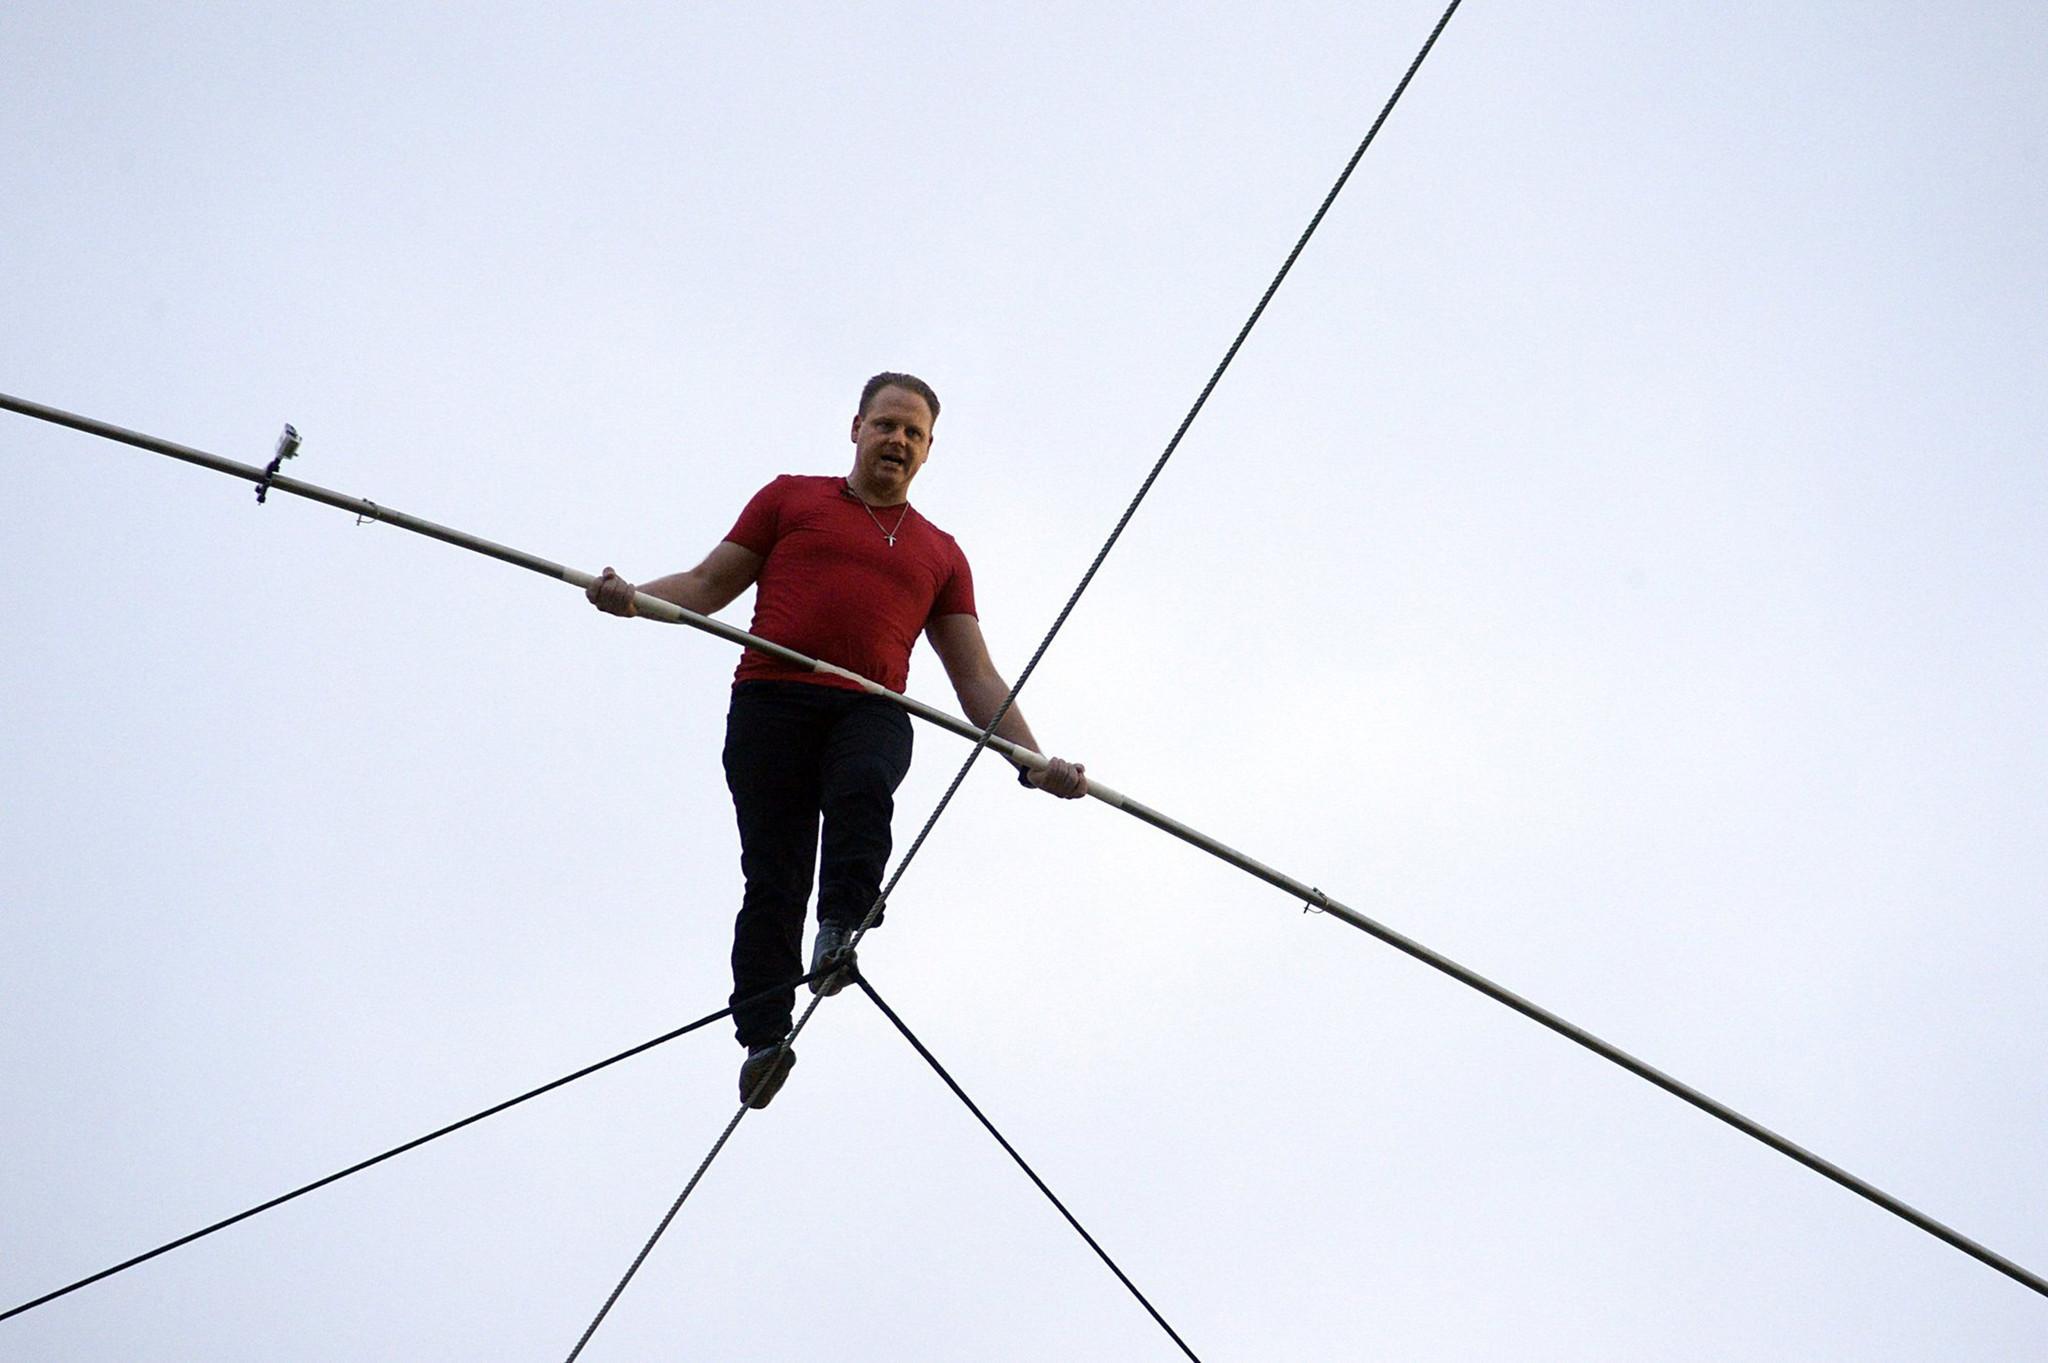 Wire-walker Nik Wallenda - Chicago Tribune